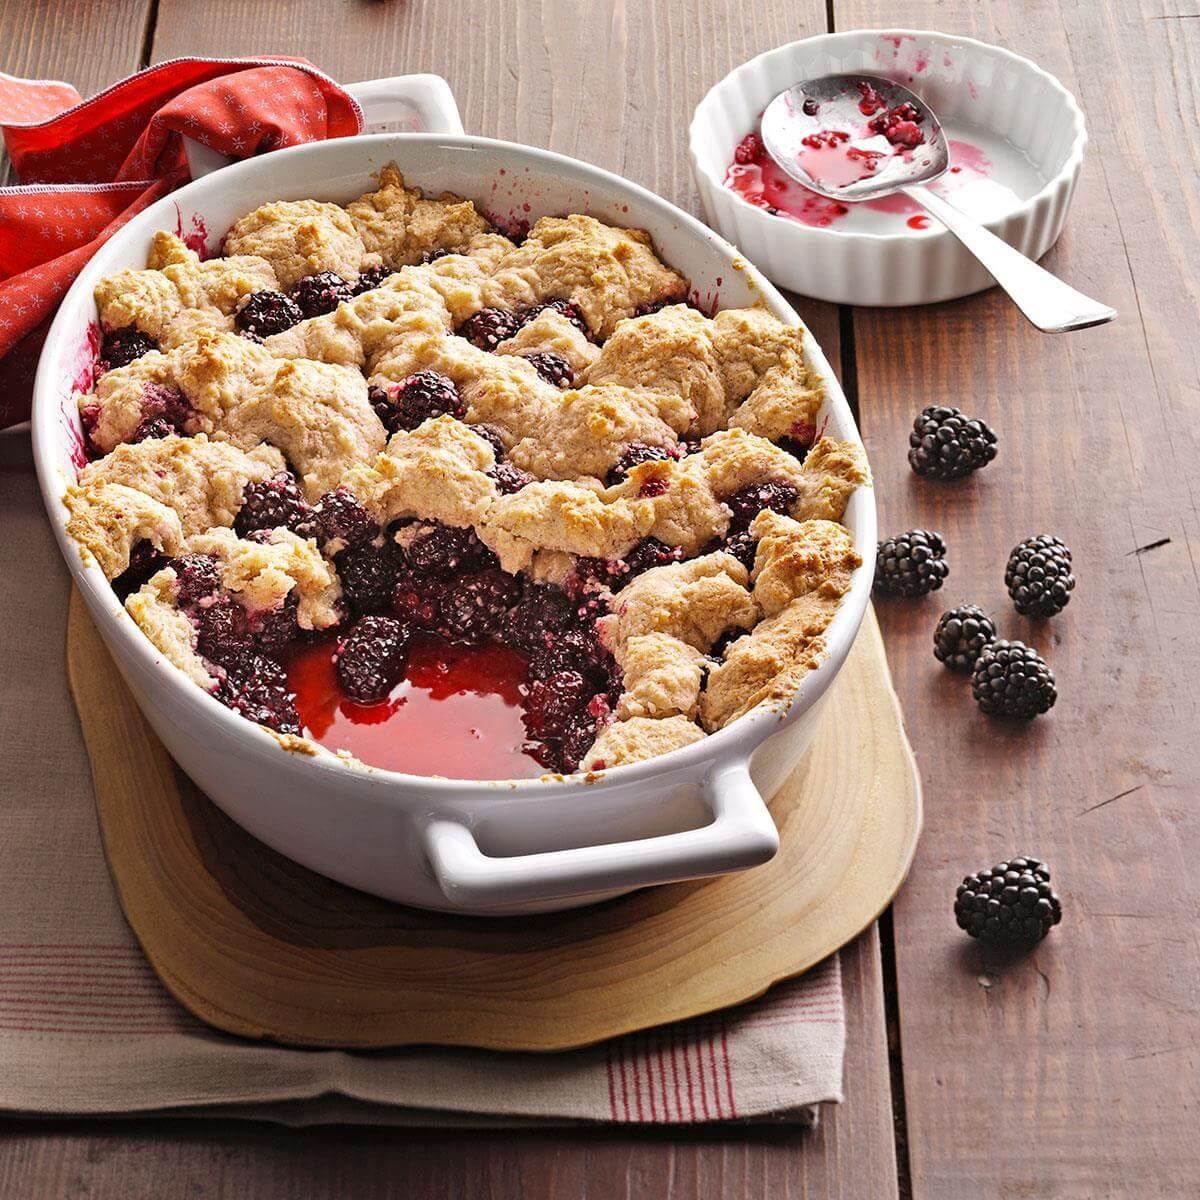 Blackberry Dessert Recipes: Summer Blackberry Cobbler Recipe